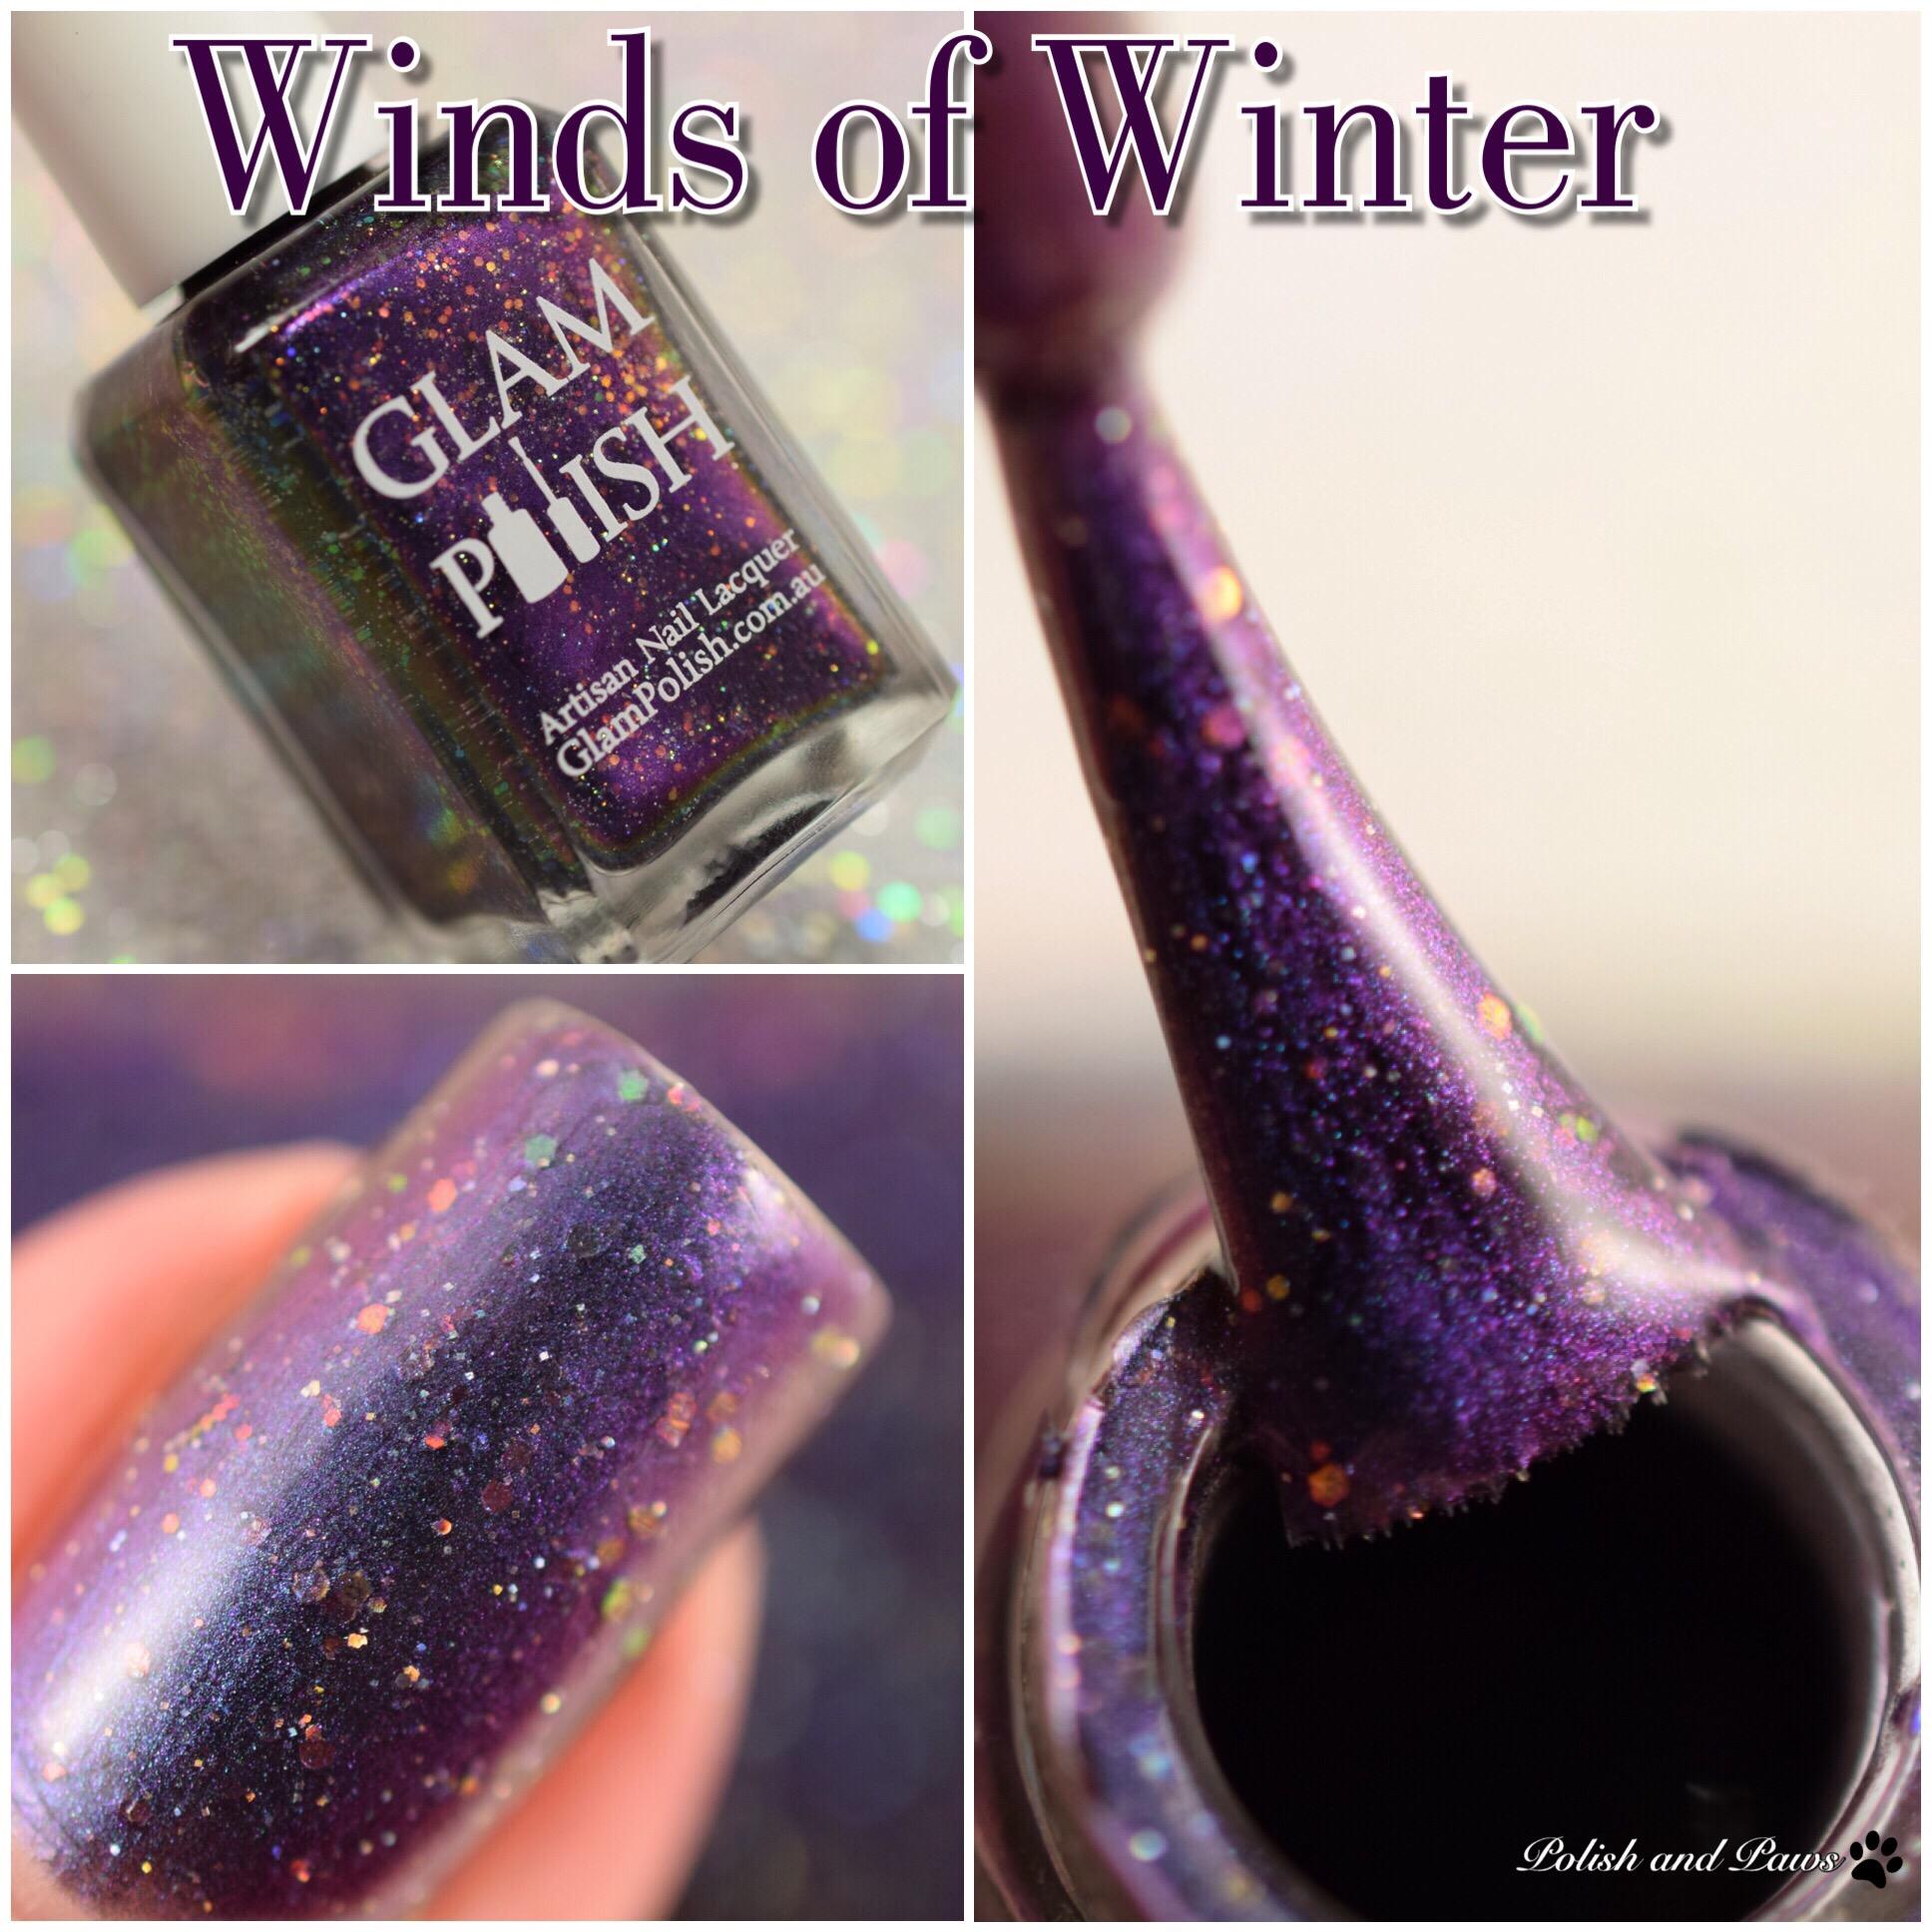 Glam Polish Winds of Winter